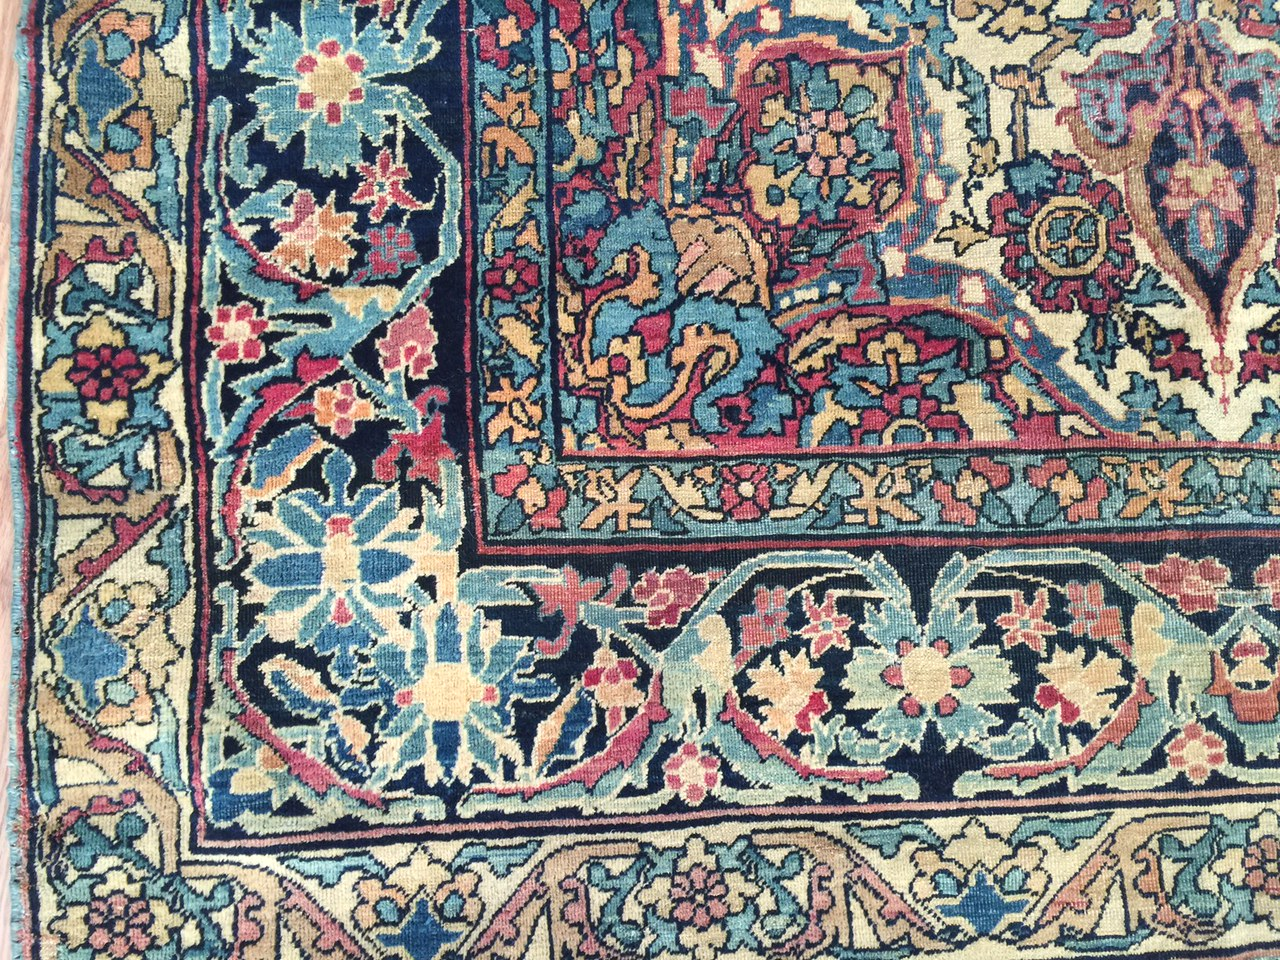 24252 Antique Kirman Lavar rug 3,9 x 6,4-2